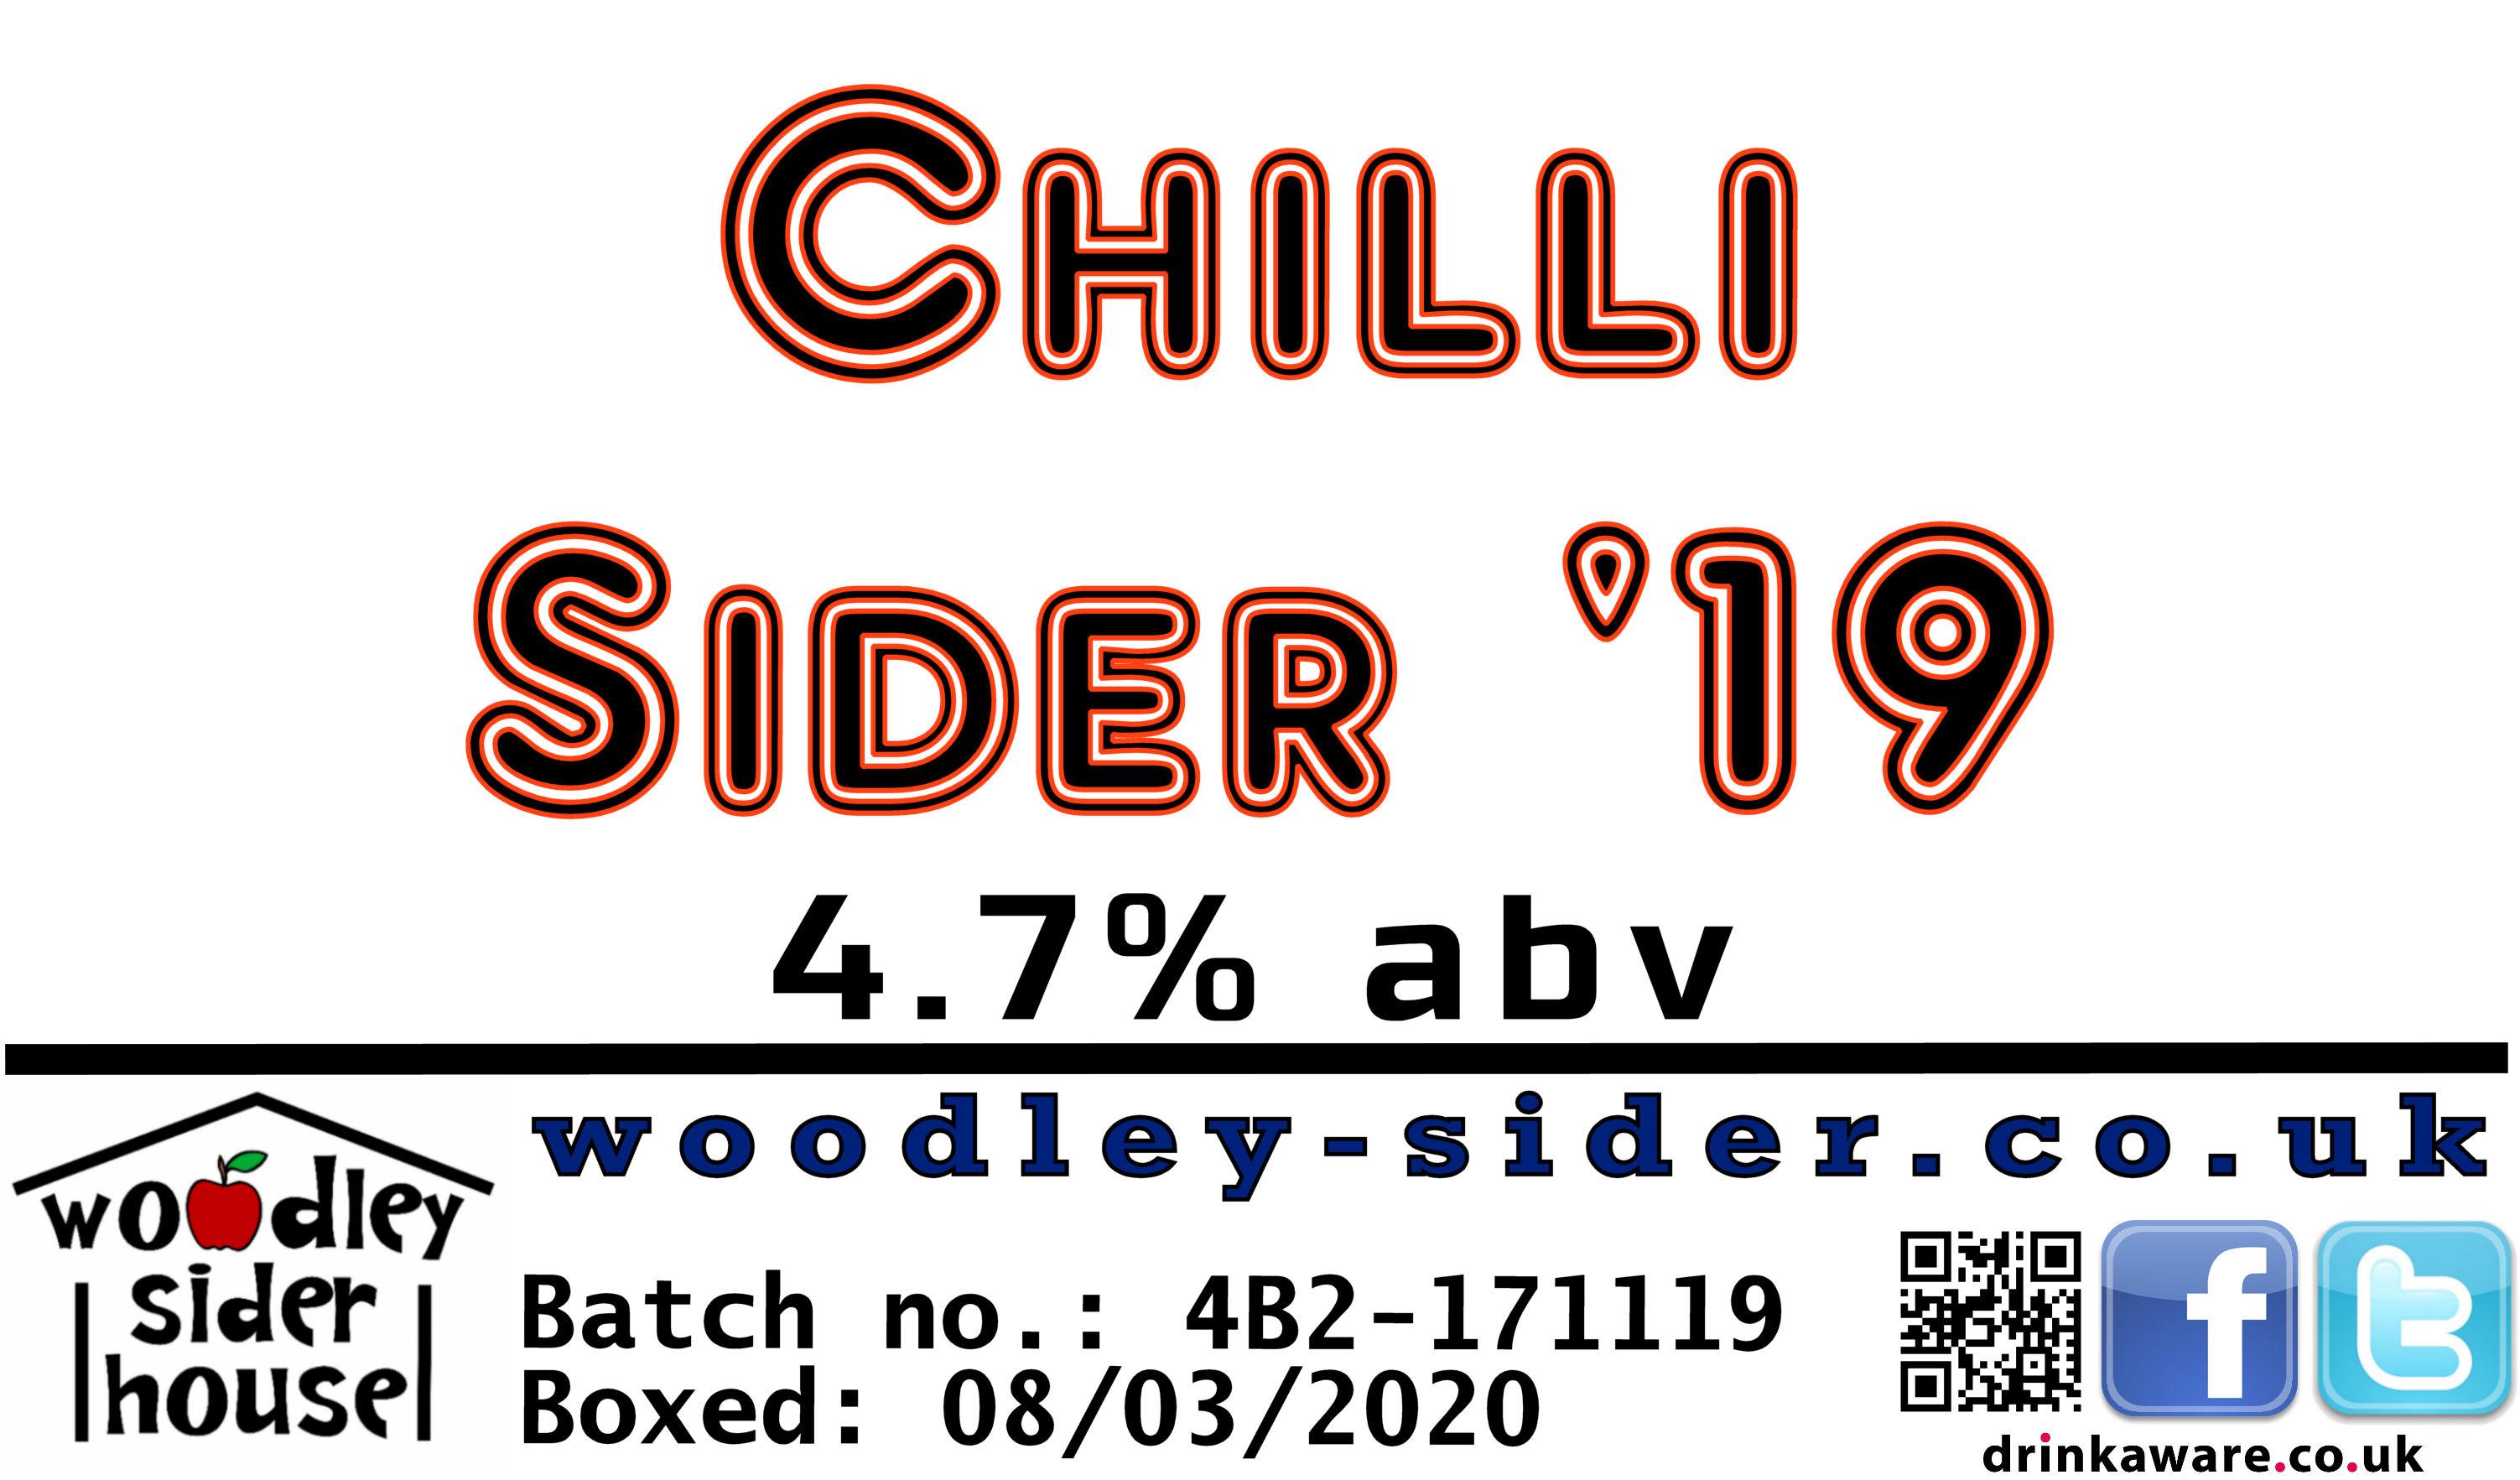 Chilli Sider '19